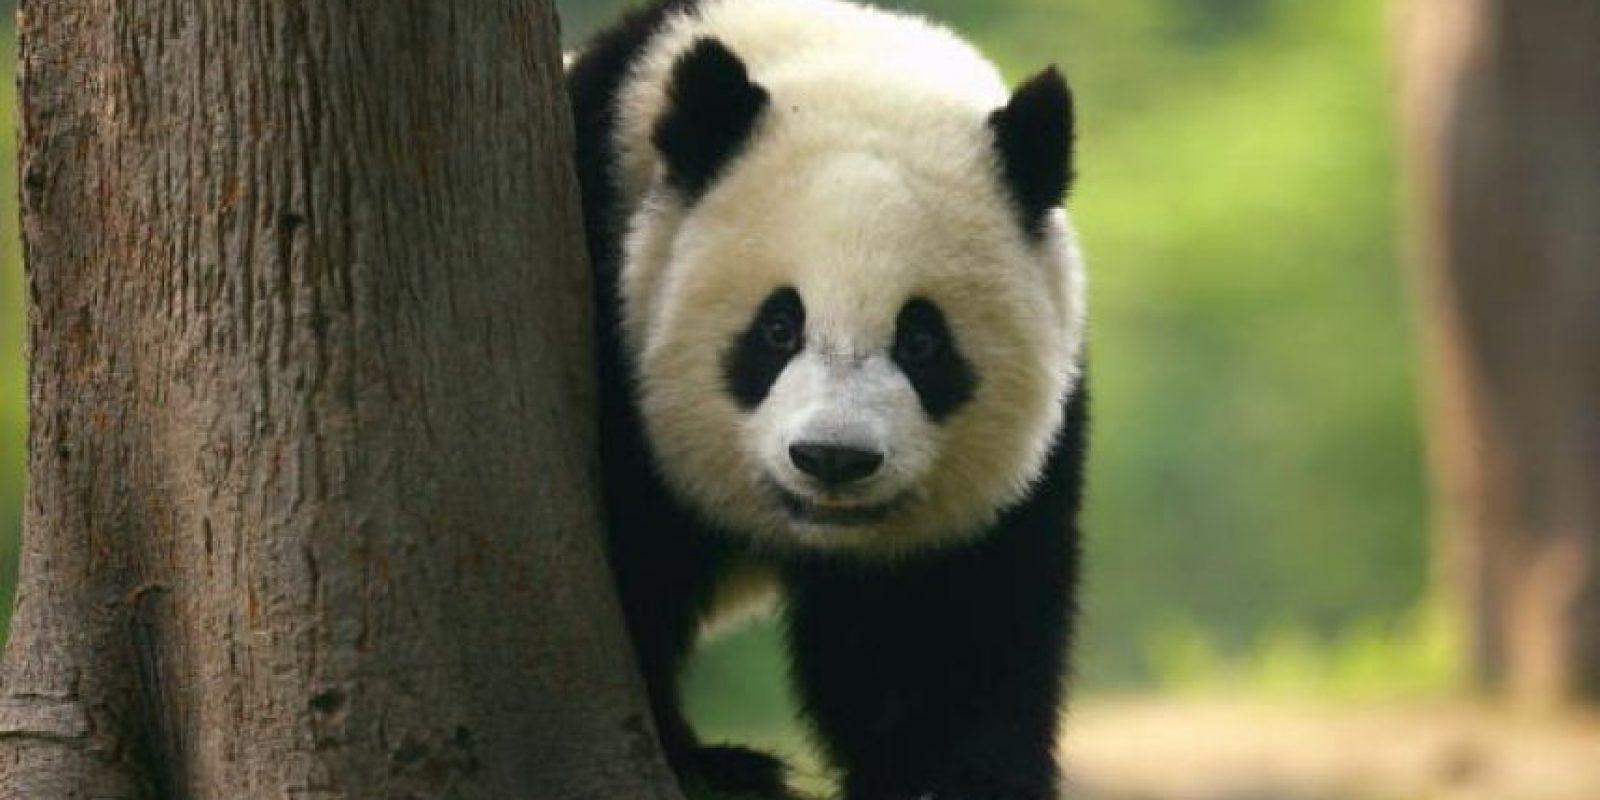 Un panda adulto puede llegar a pesar hasta 150 kg Foto:Getty Images